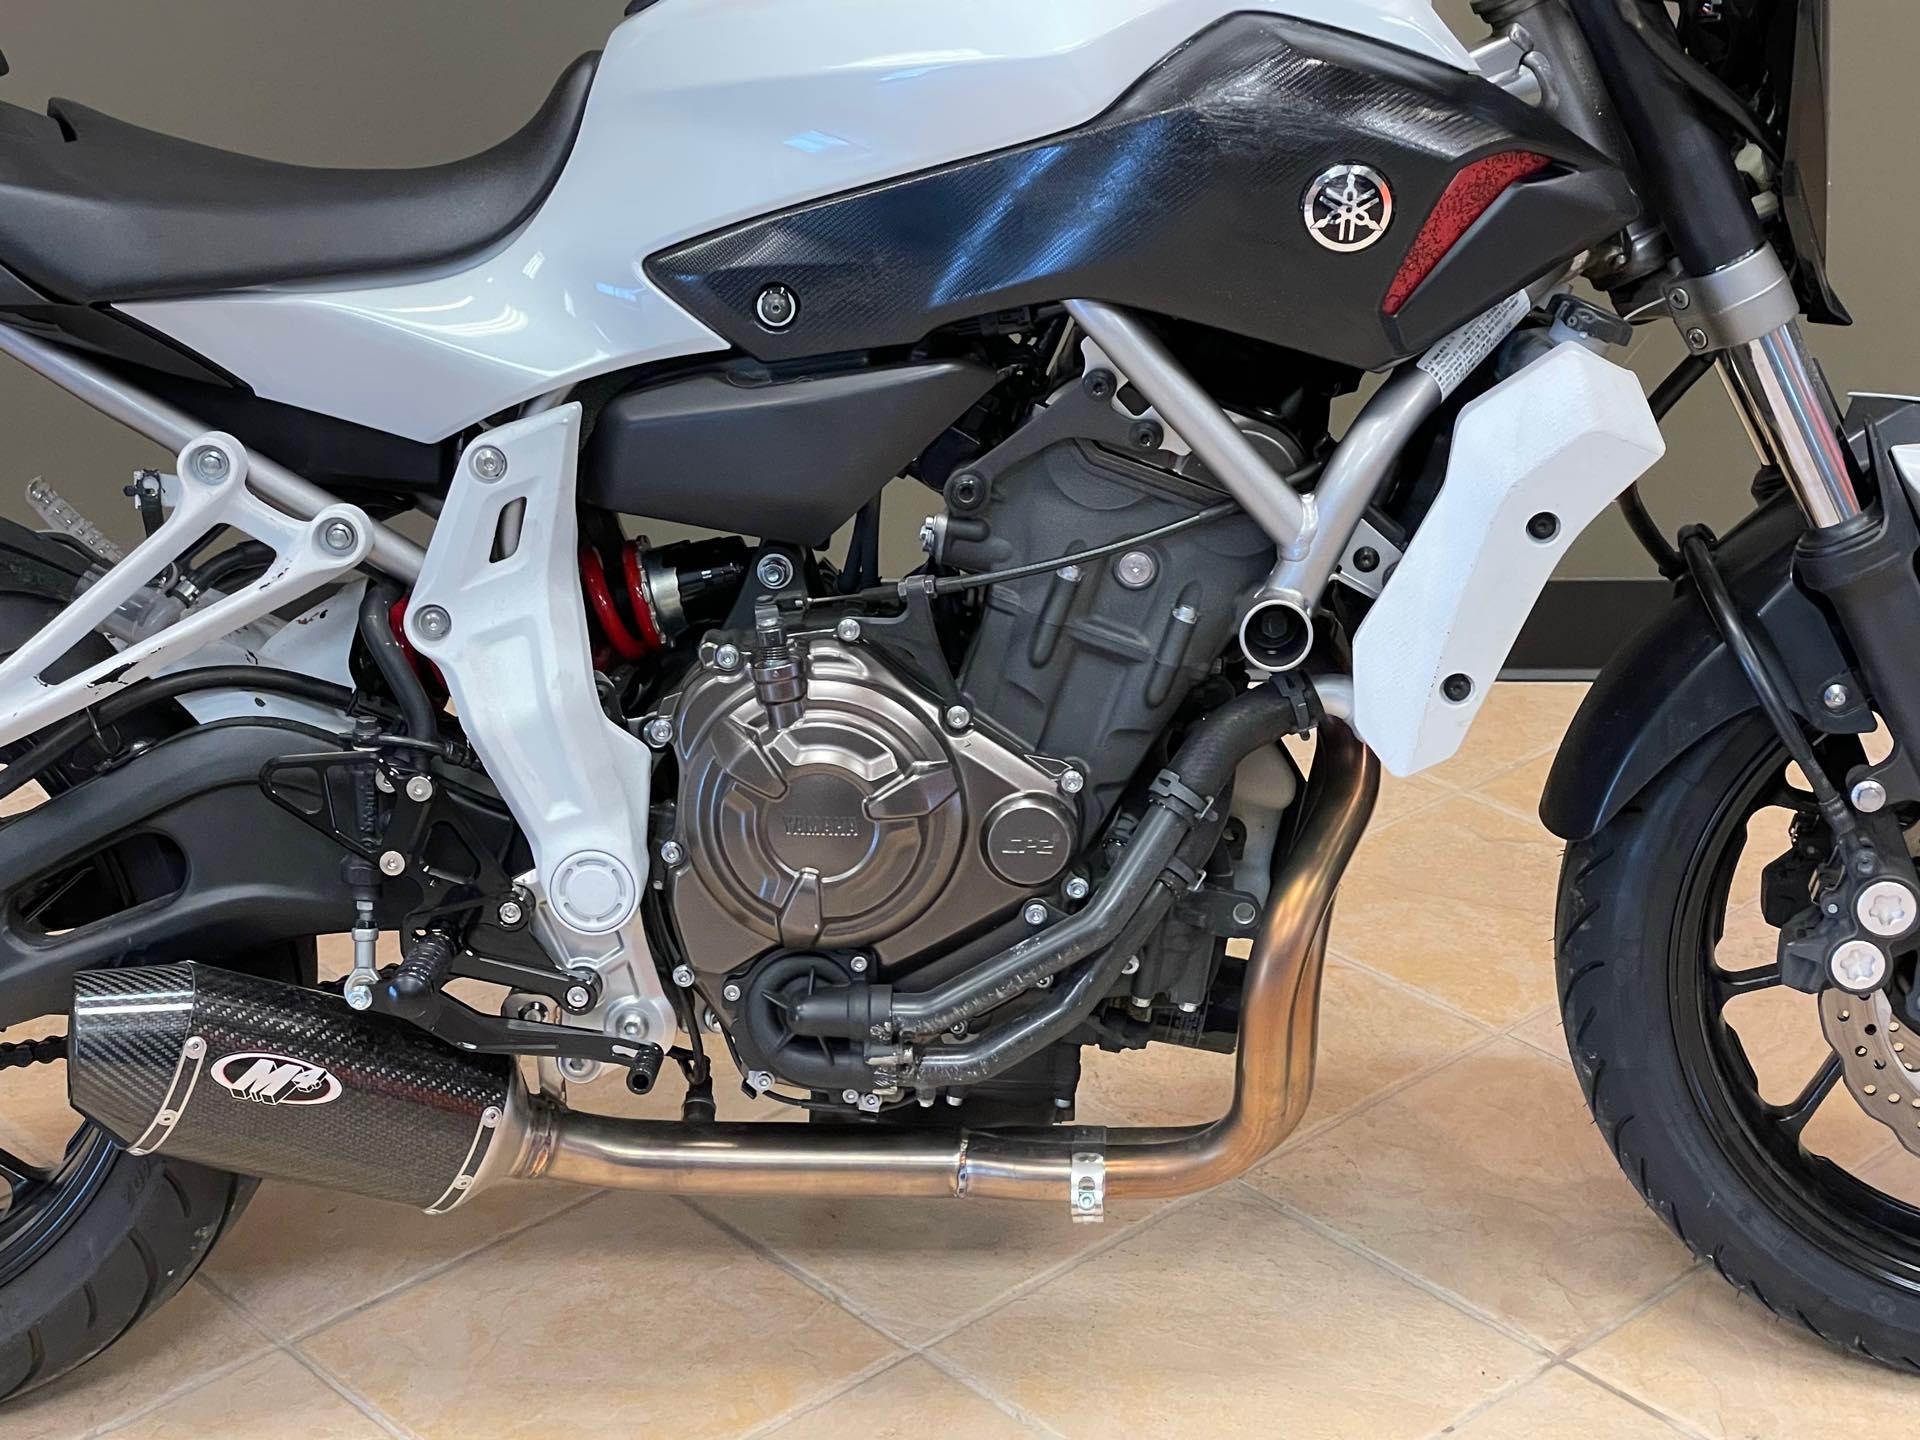 2015 Yamaha FZ 07 at Loess Hills Harley-Davidson